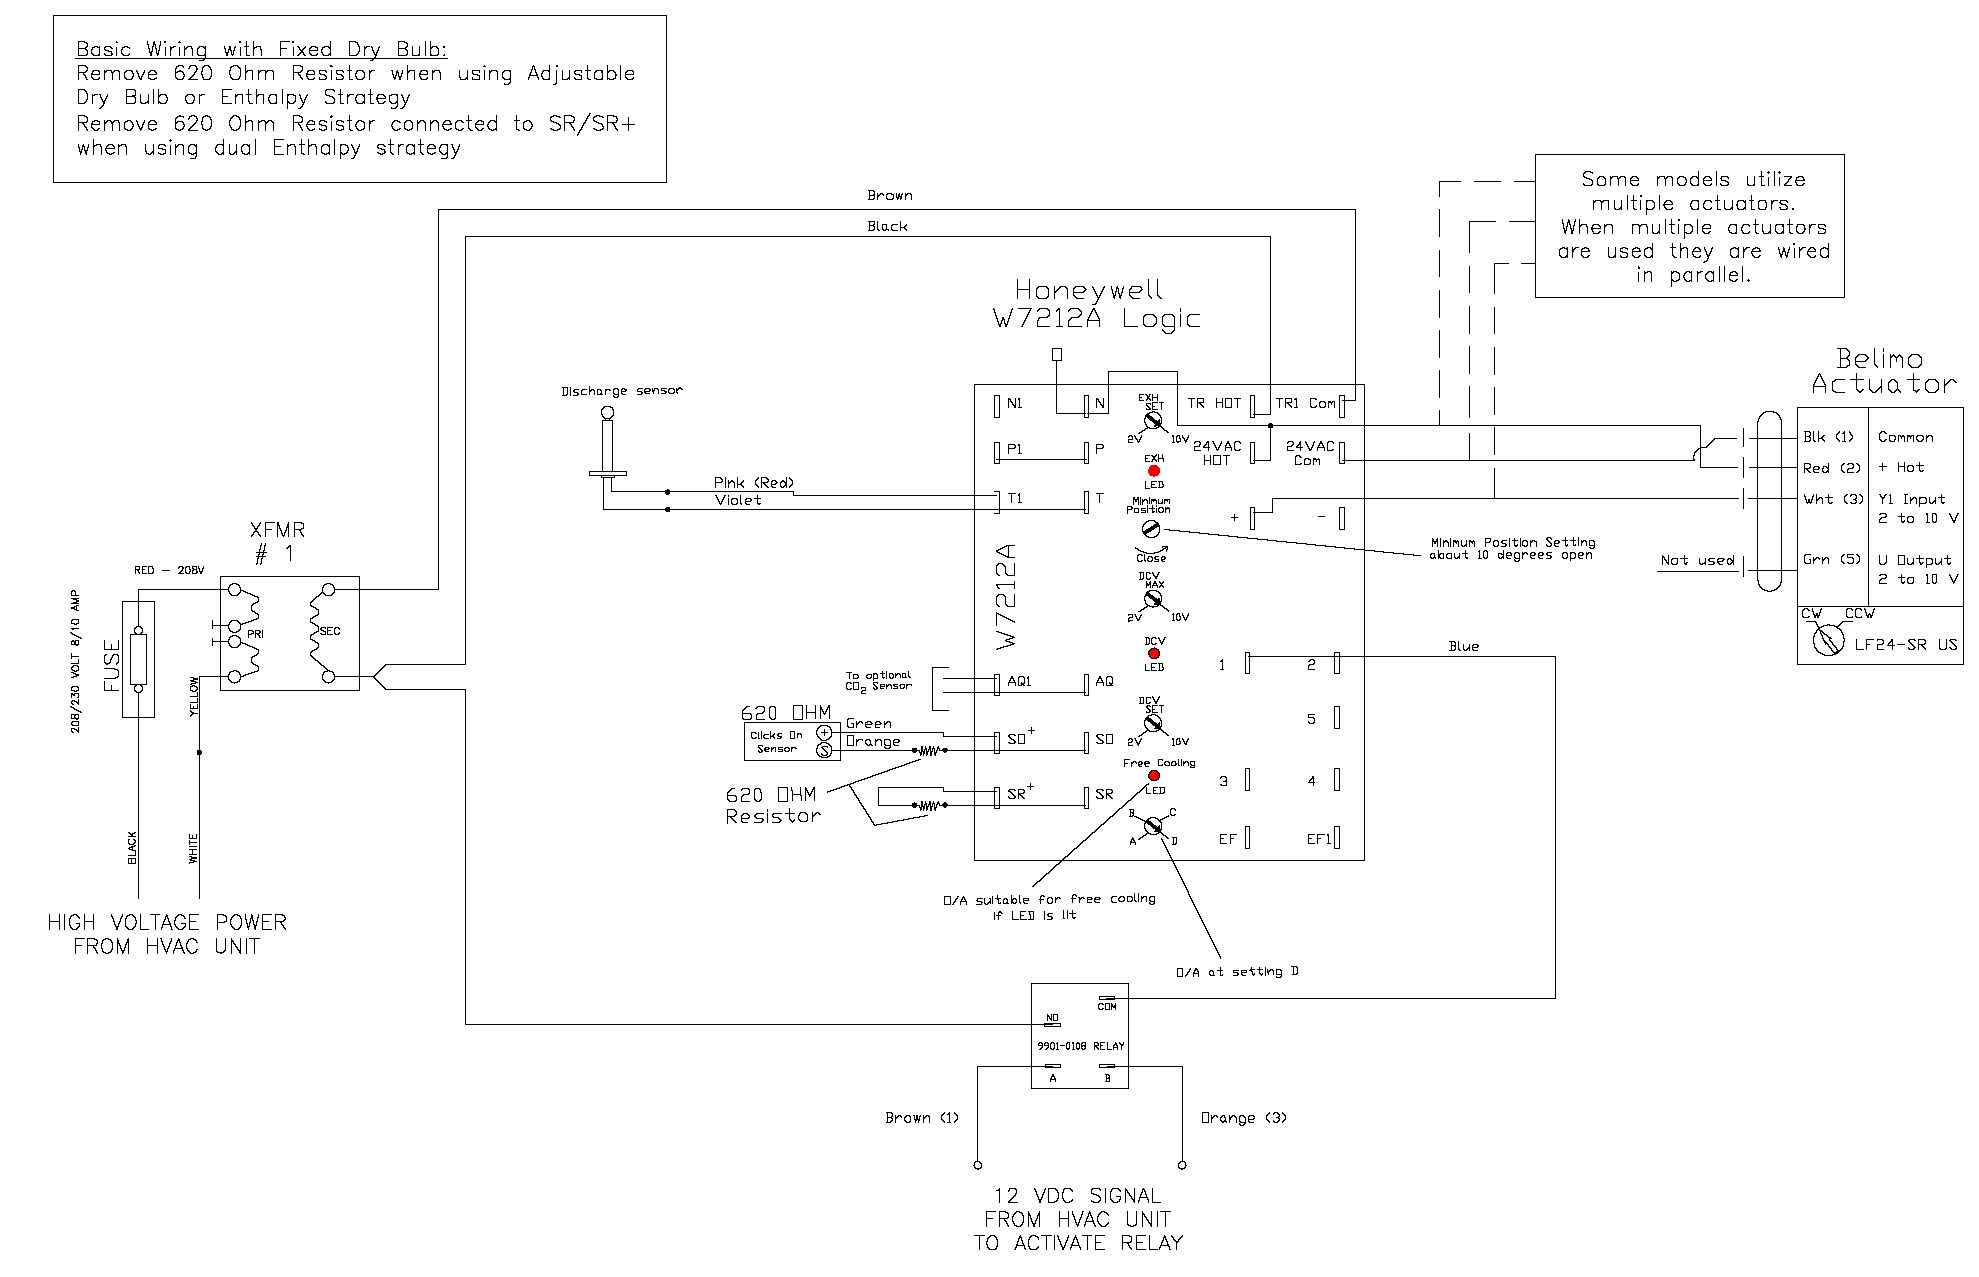 York Schematics Y14 - Wiring Diagram Dash on ford model, engine model, cabinet model, system model, motor model, parts model, battery model,